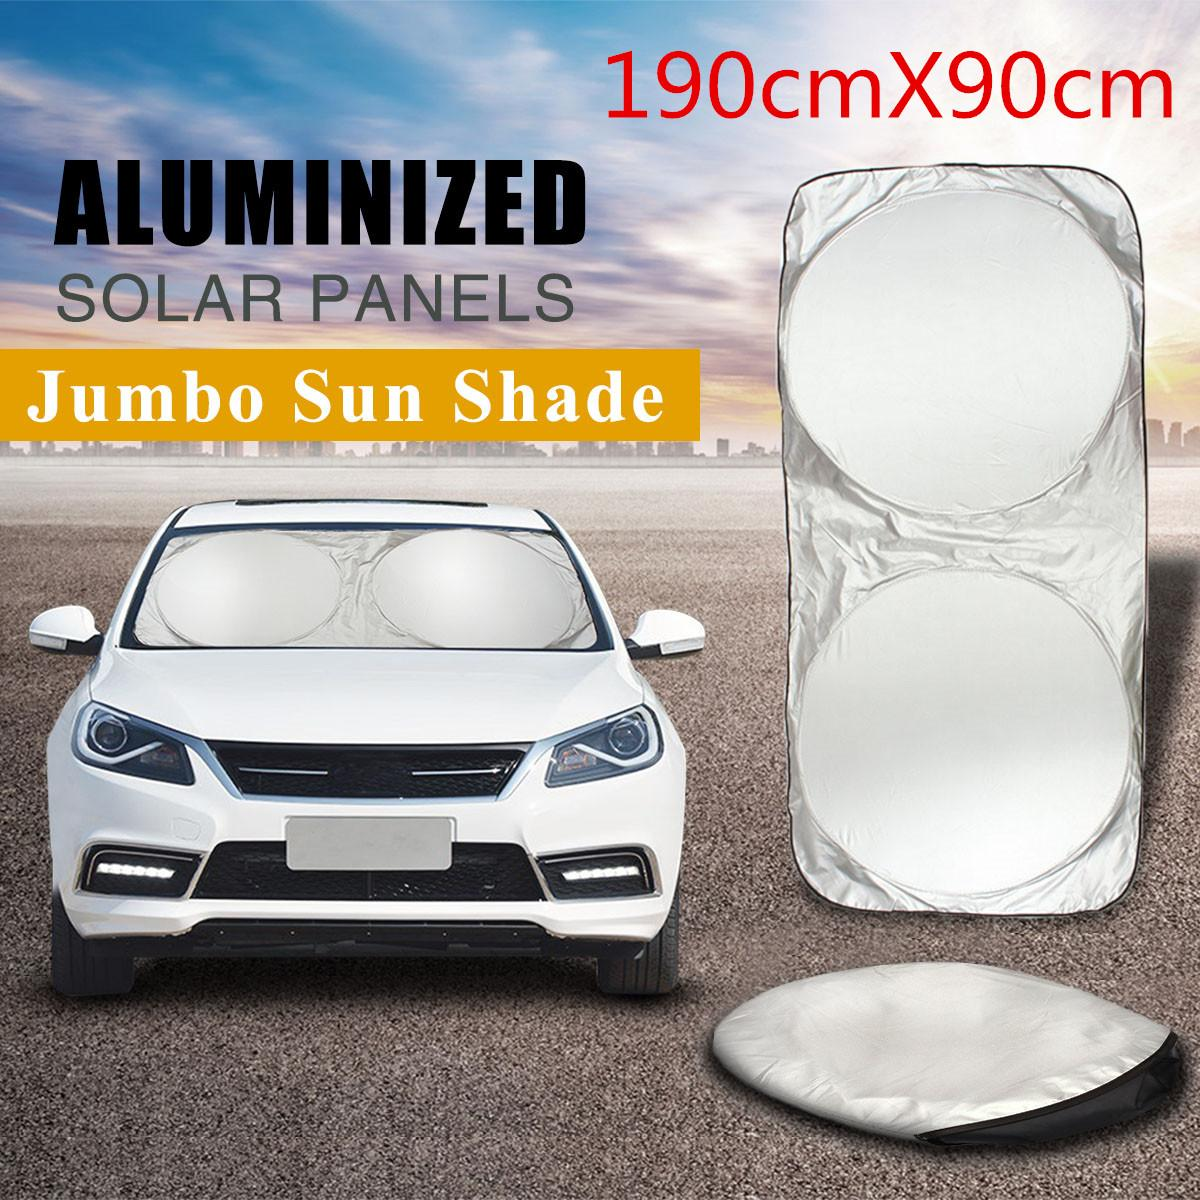 190x90cm Car Sunshade Folding Jumbo Front Rear Window Sun Shade Visor Windshield Block Cover UV Protect Shield Film Reflective